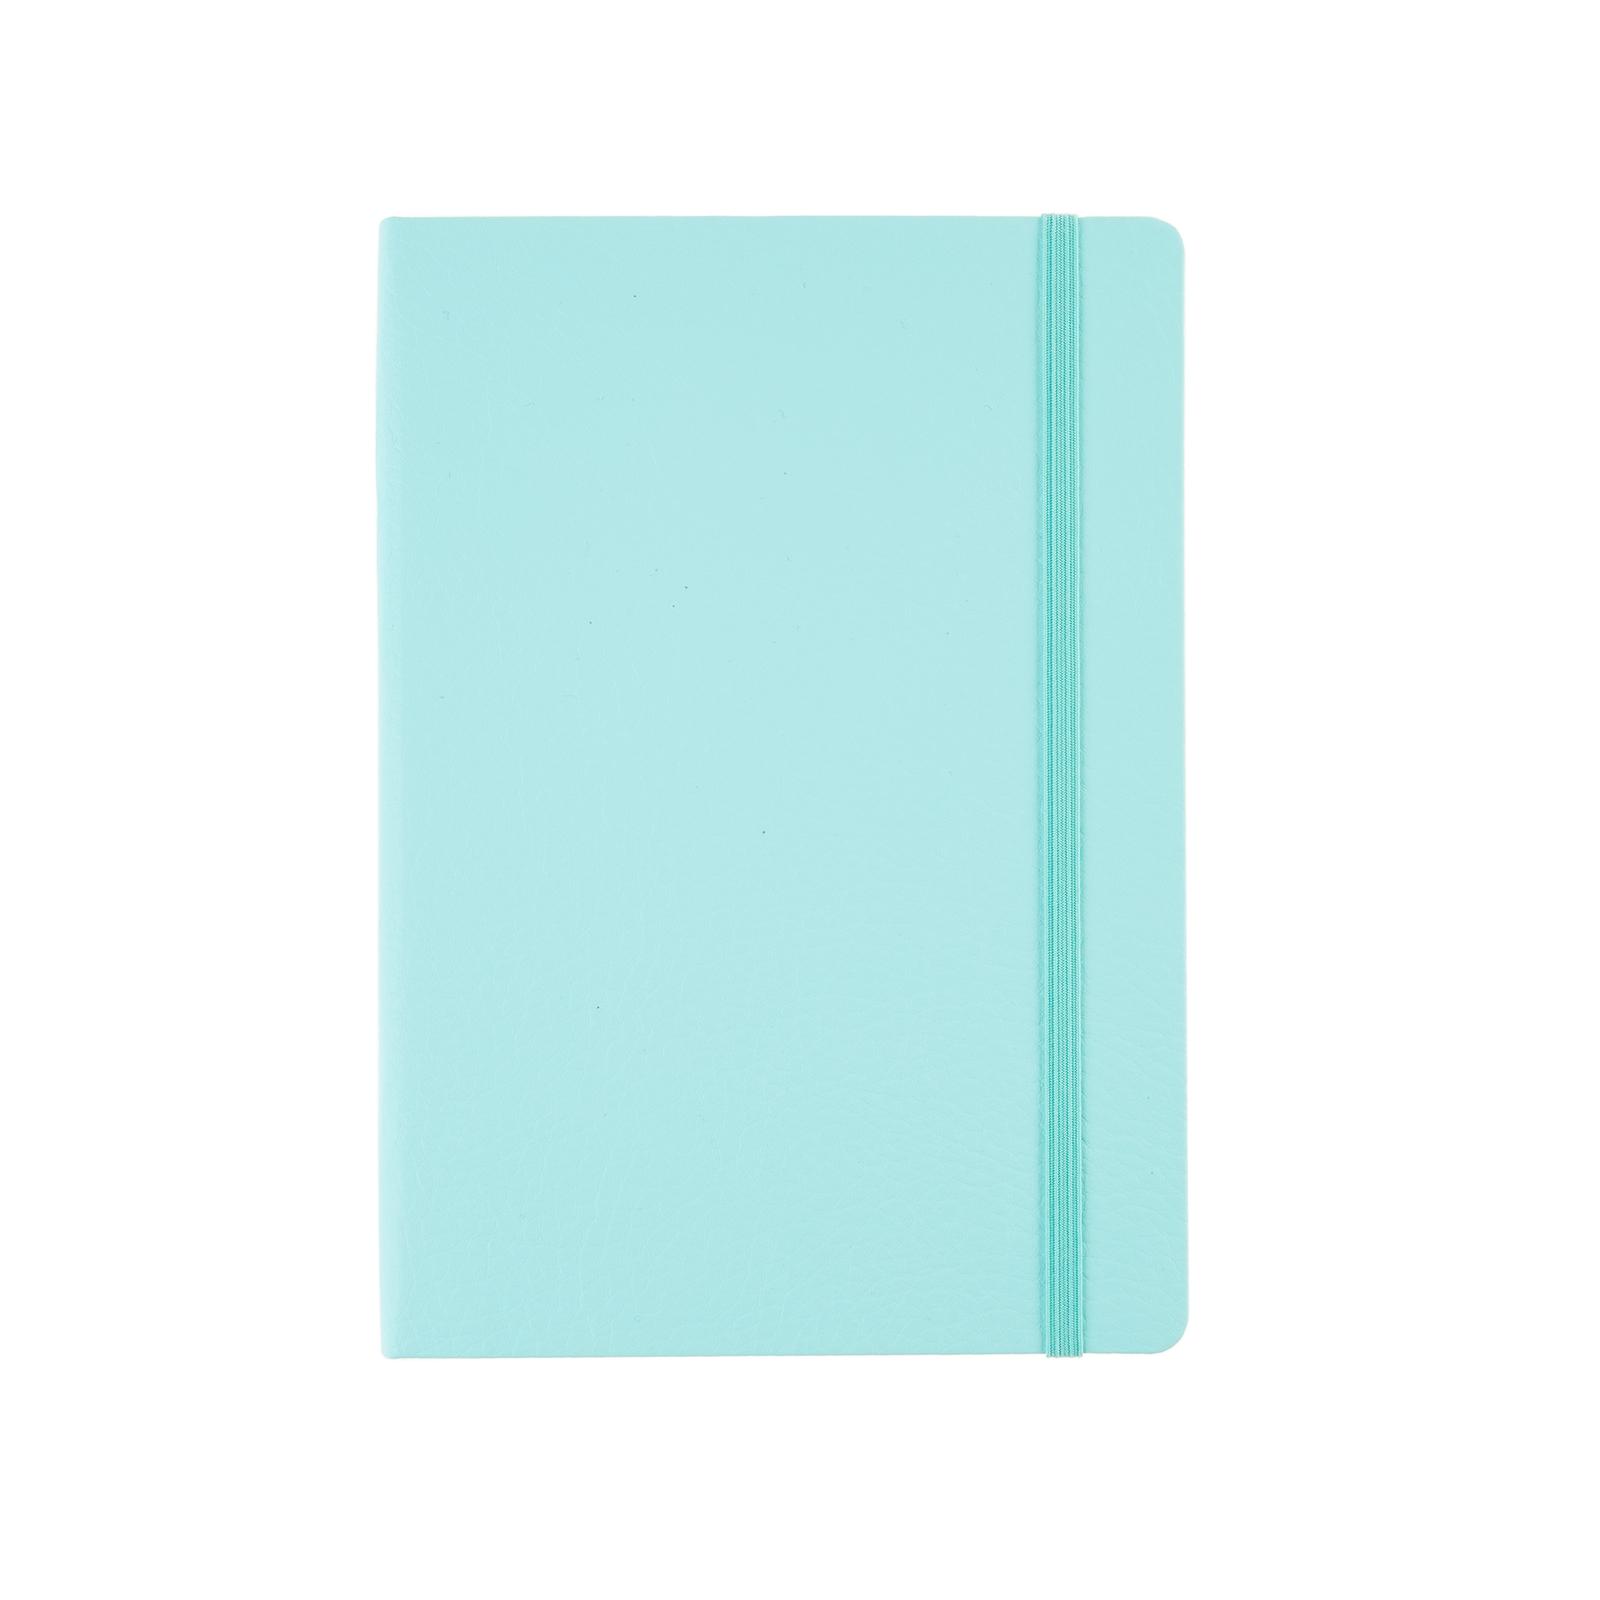 Collins B6 Ruled Notebook - Aquamarine